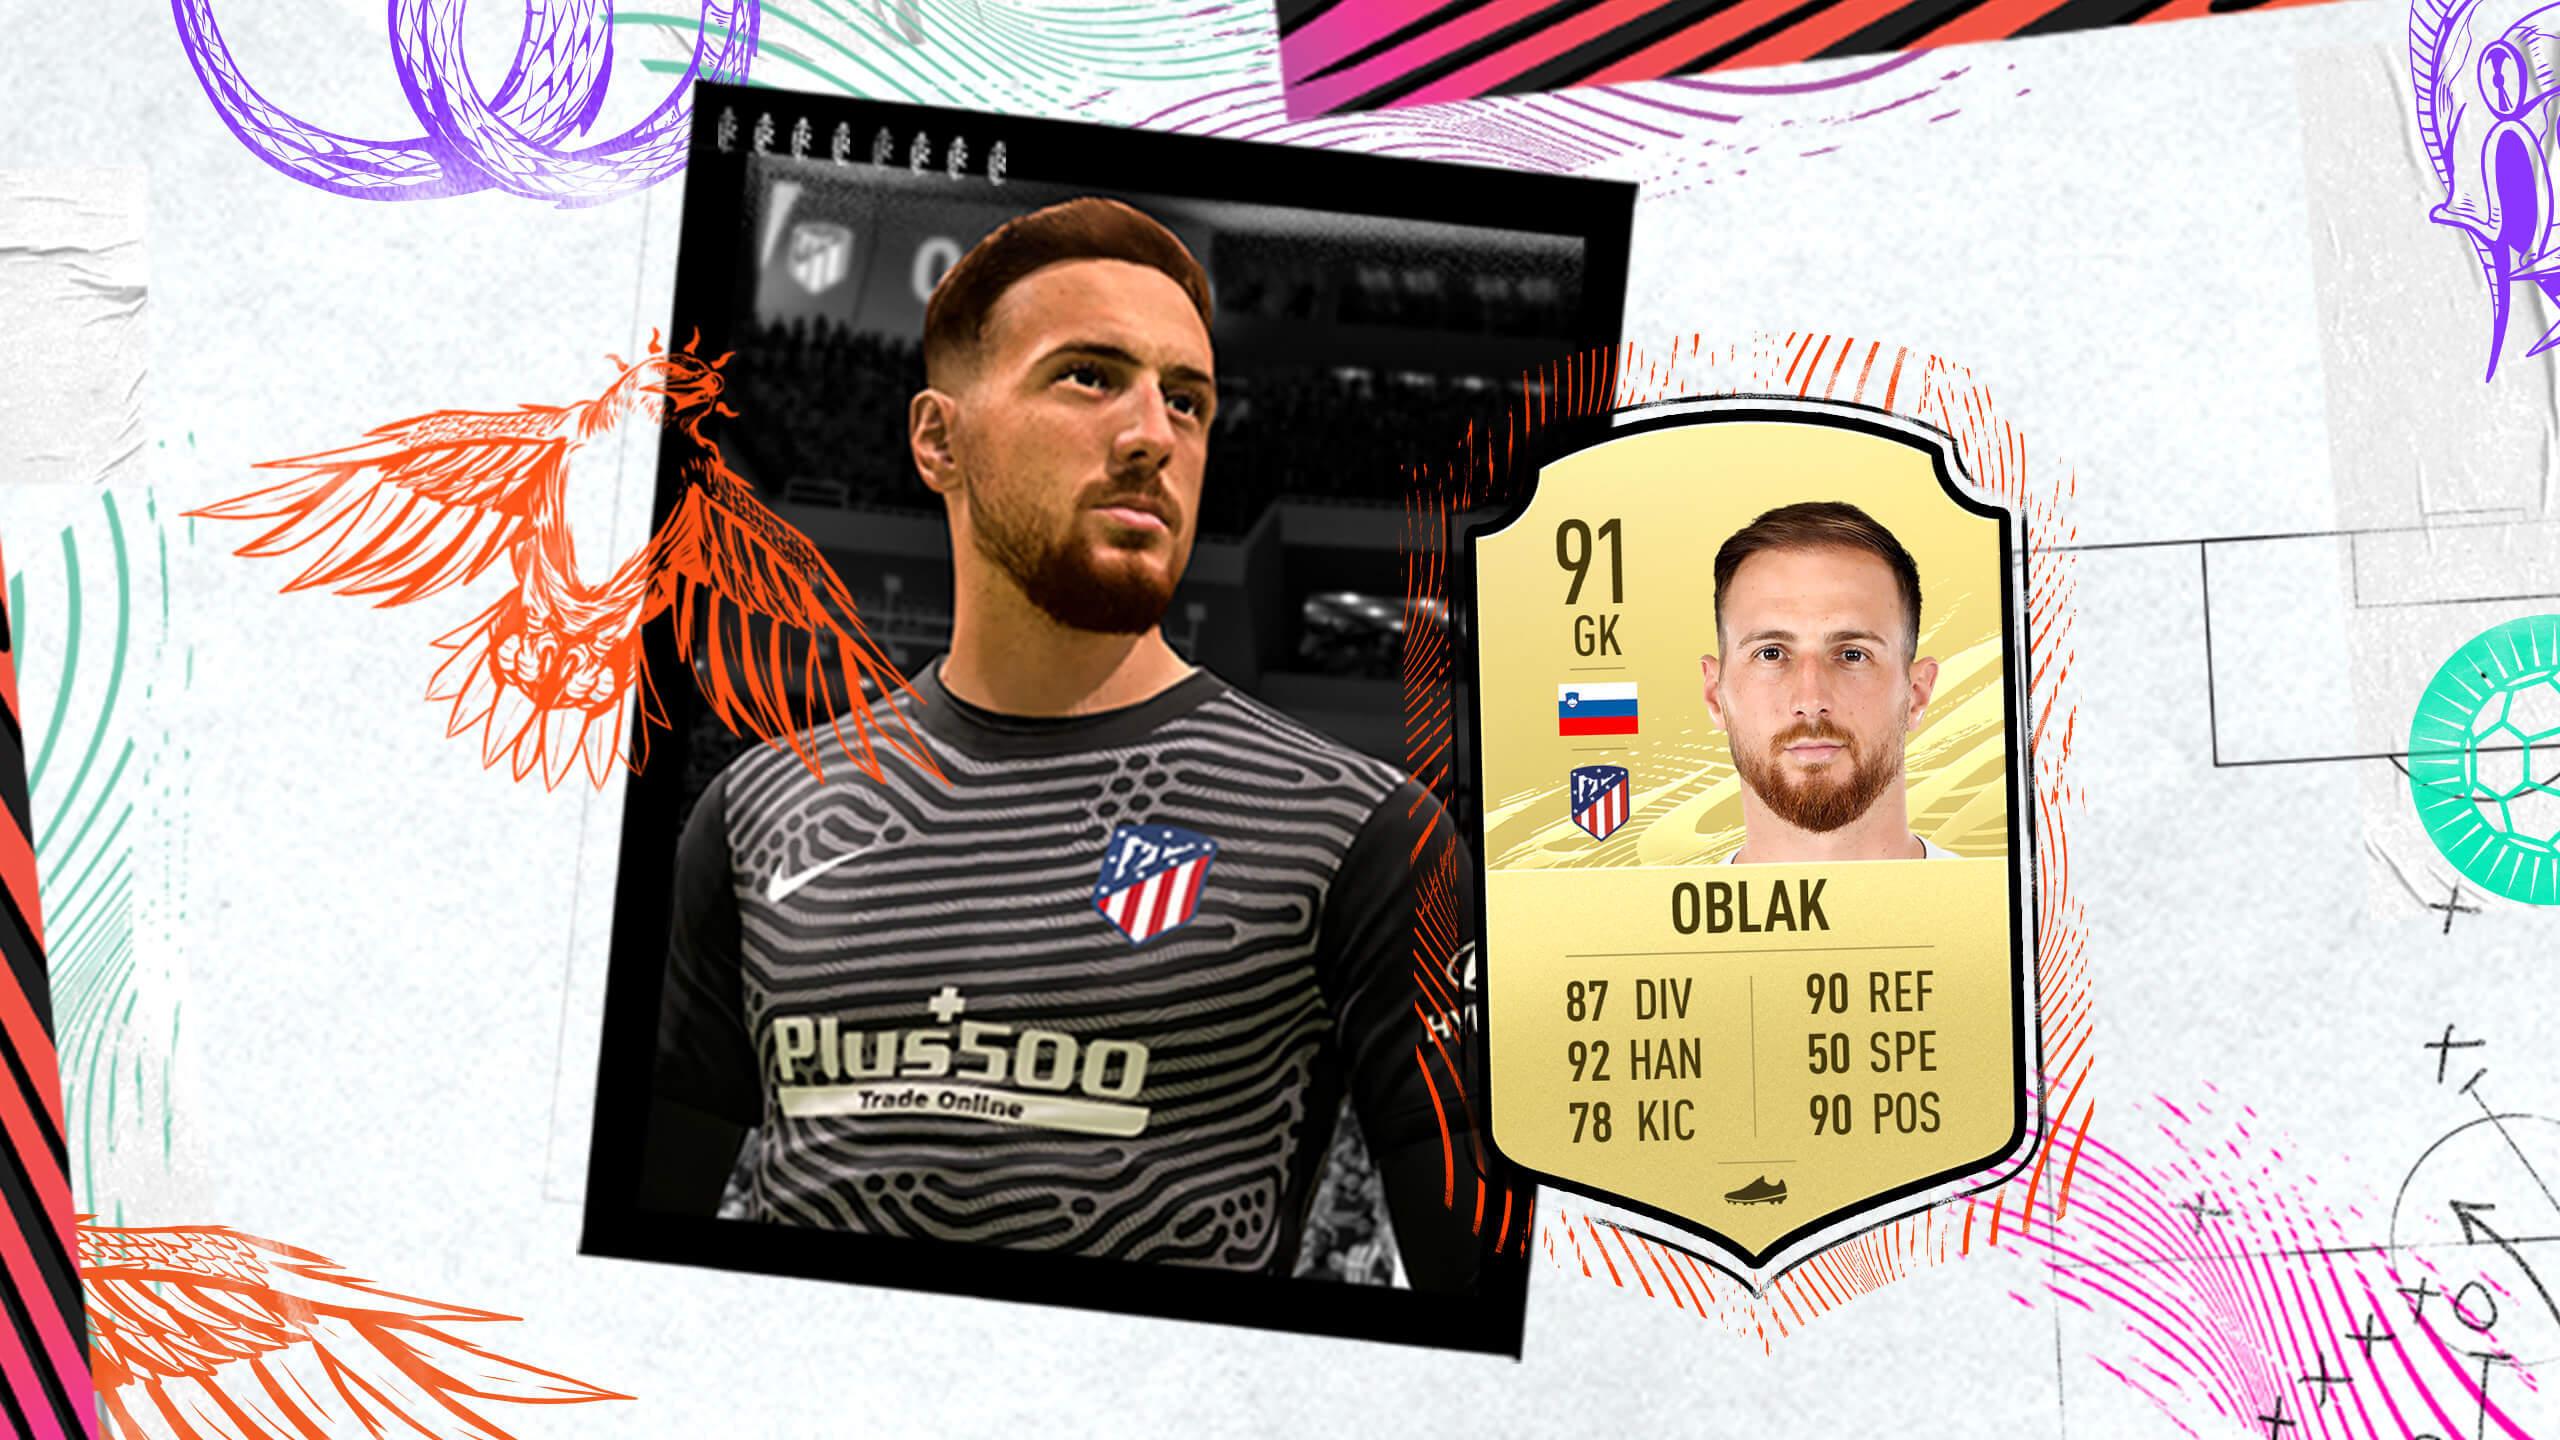 Jan Oblak FIFA 21